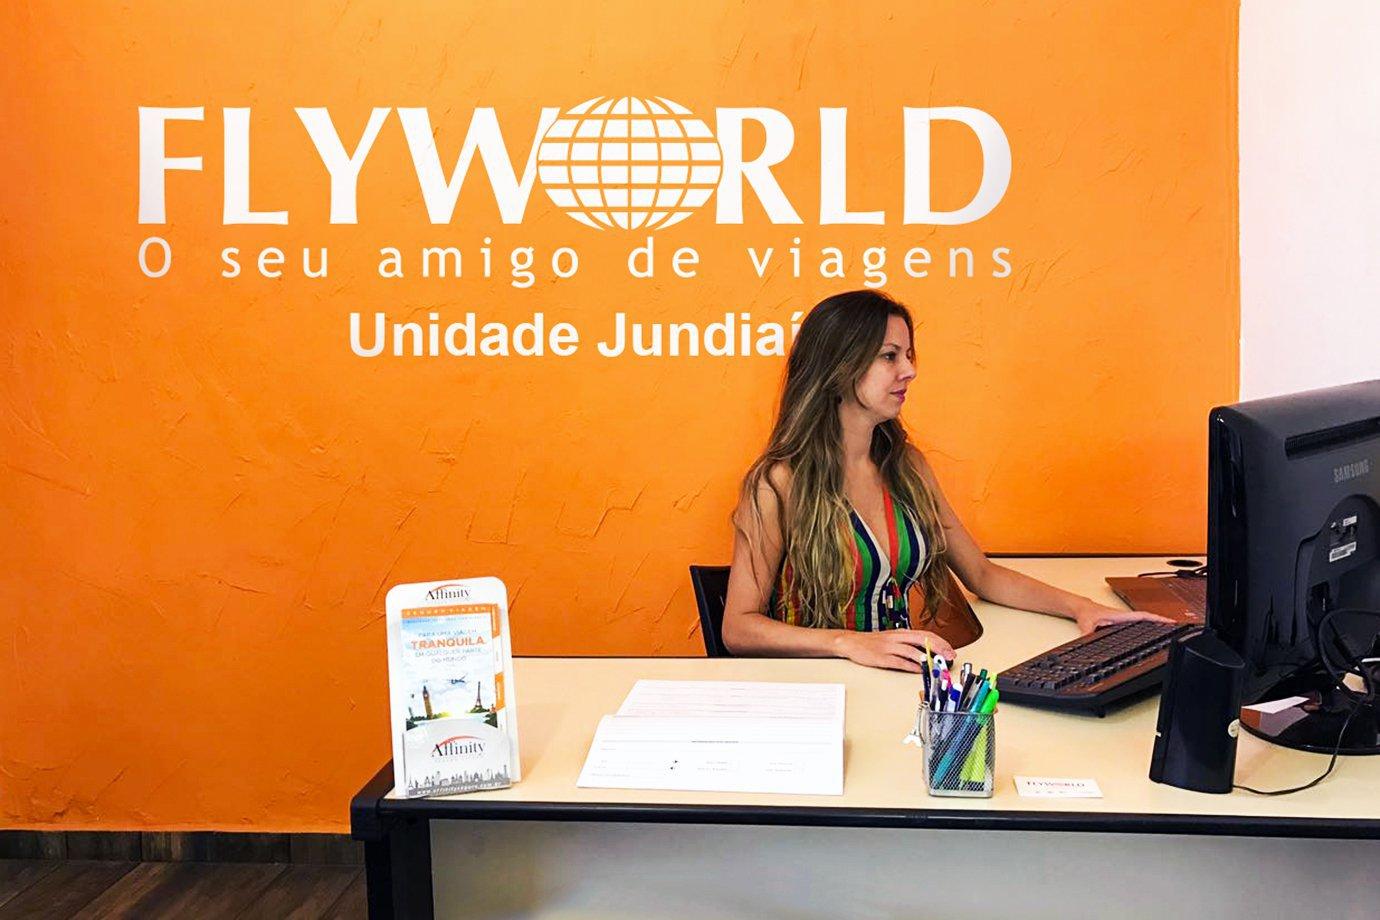 FlyWorld